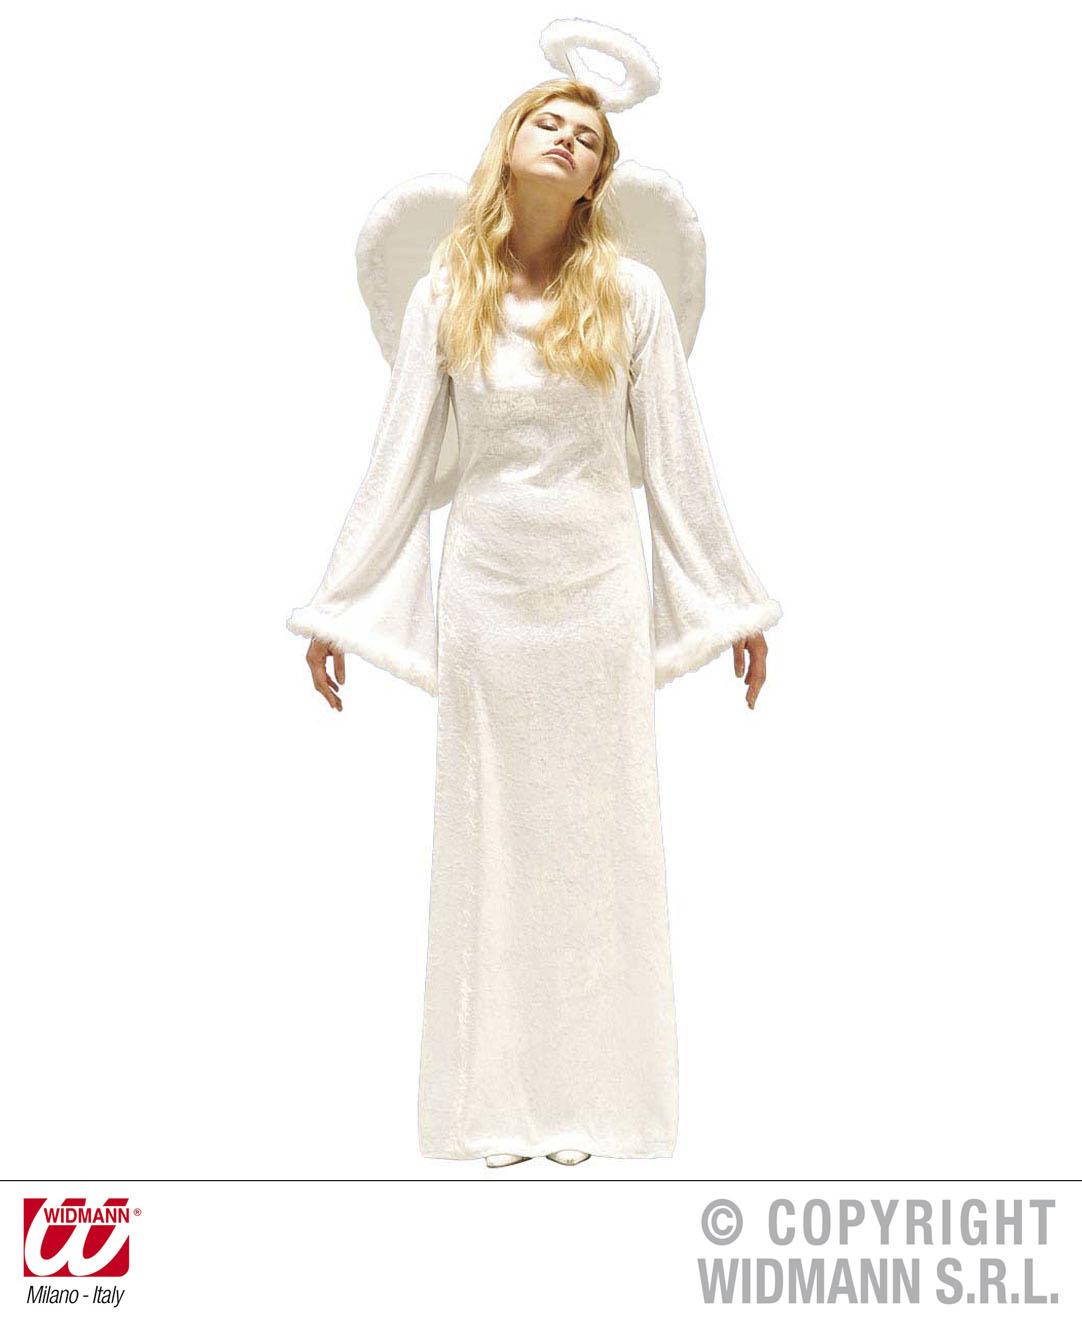 3 tlg. EngelsKostüm lang, Engel Kostüm, Flügel, Heiligenschein 36-38